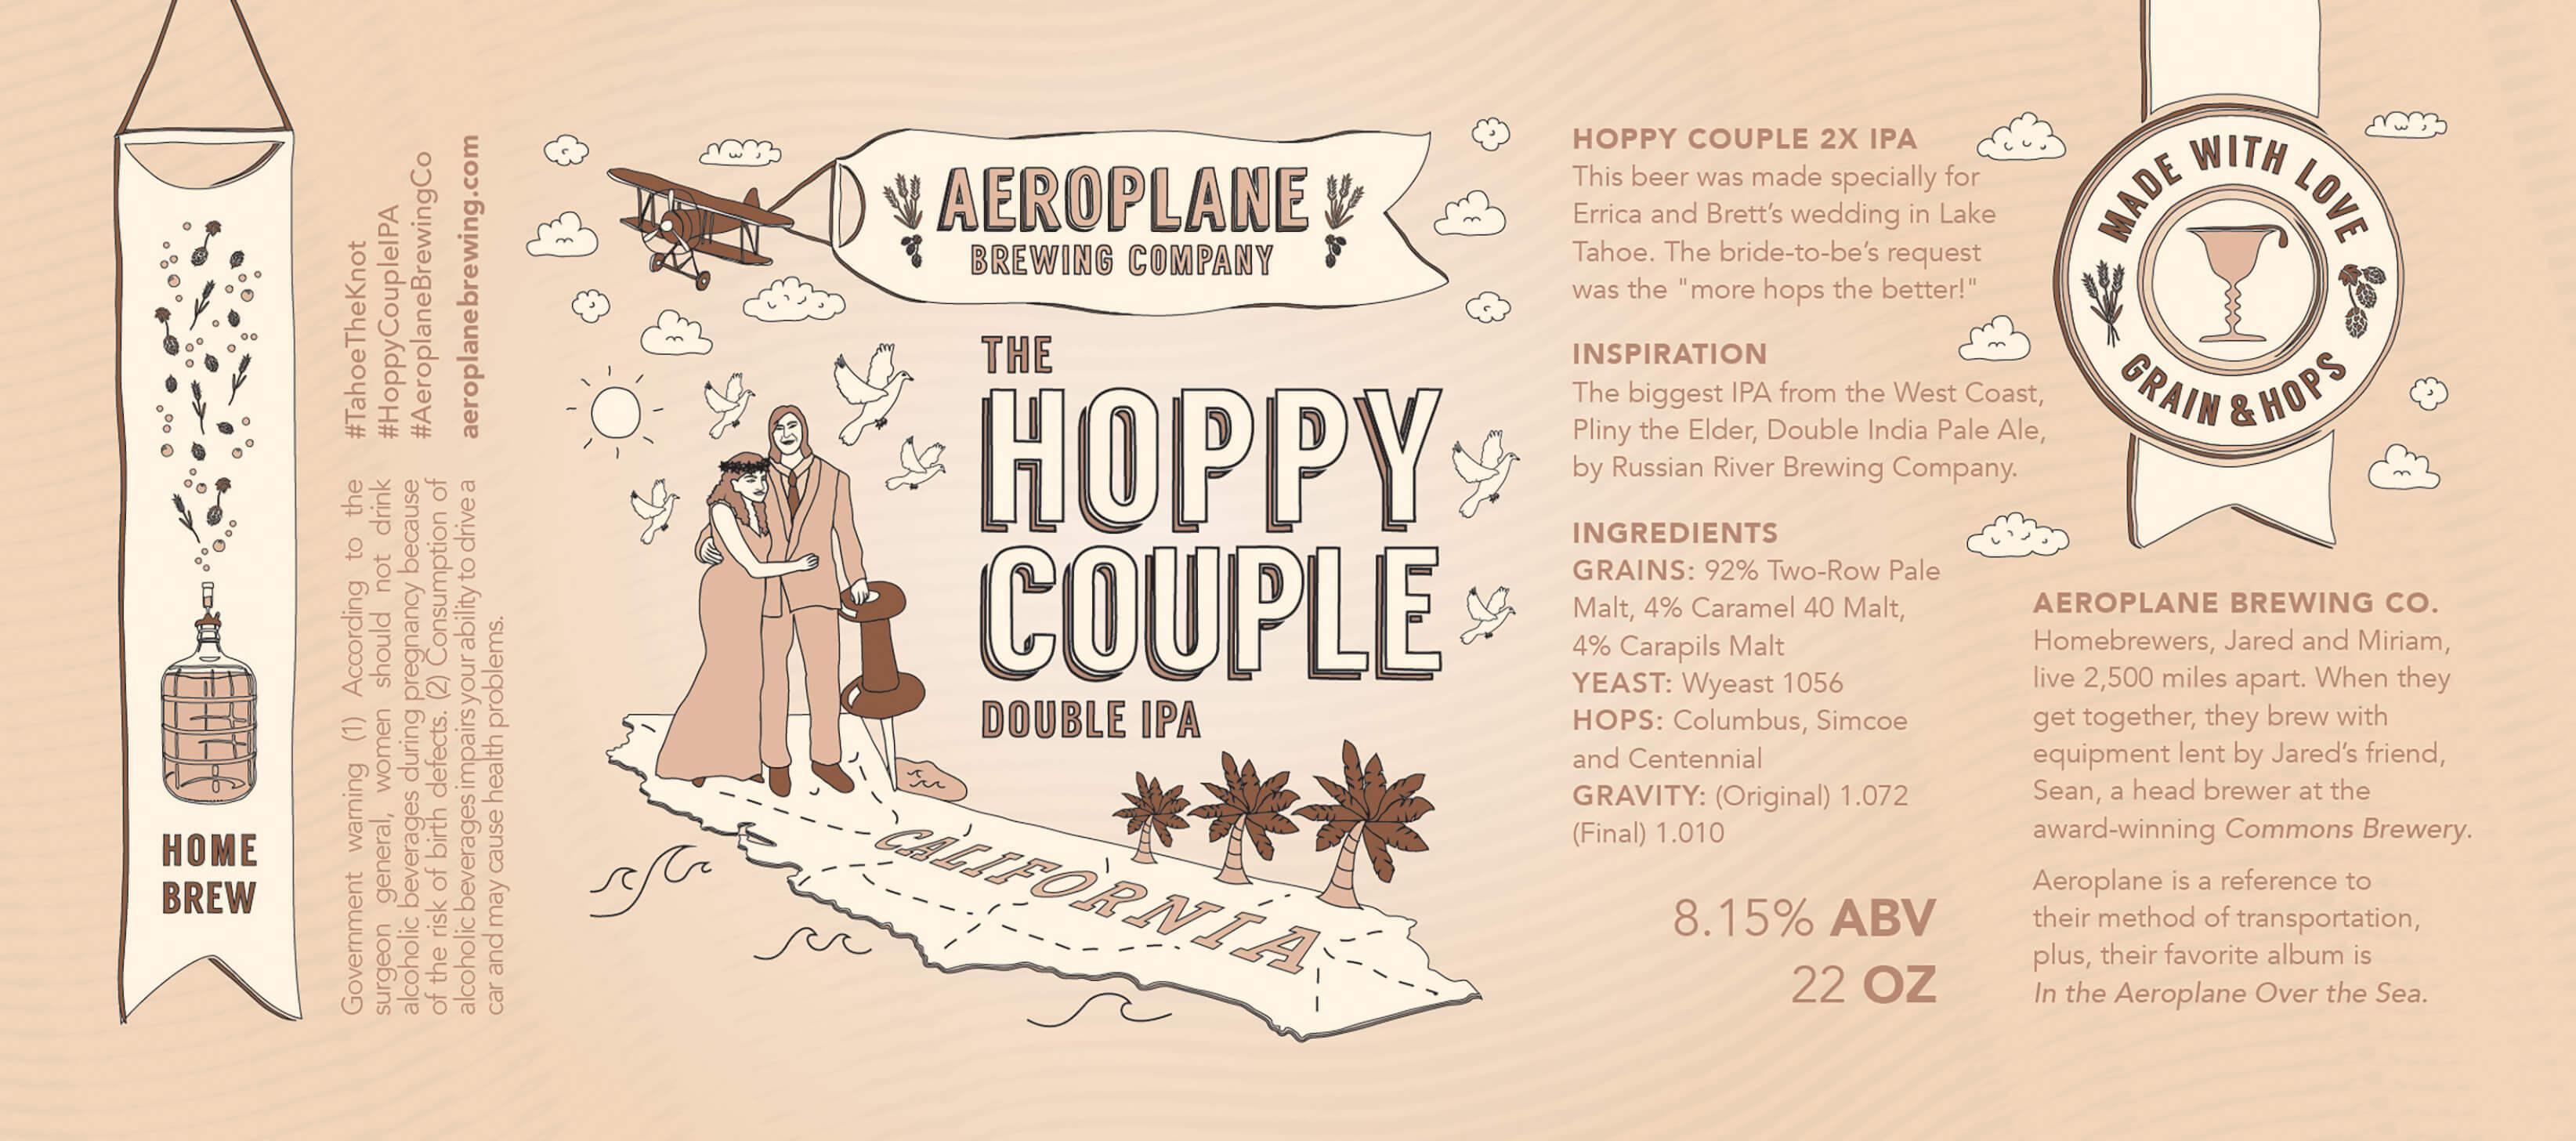 SEMPLICE_AEROPLANE_LABEL_NODROPSHADOW_112817_V4_0005_HOPPY-COUPLE